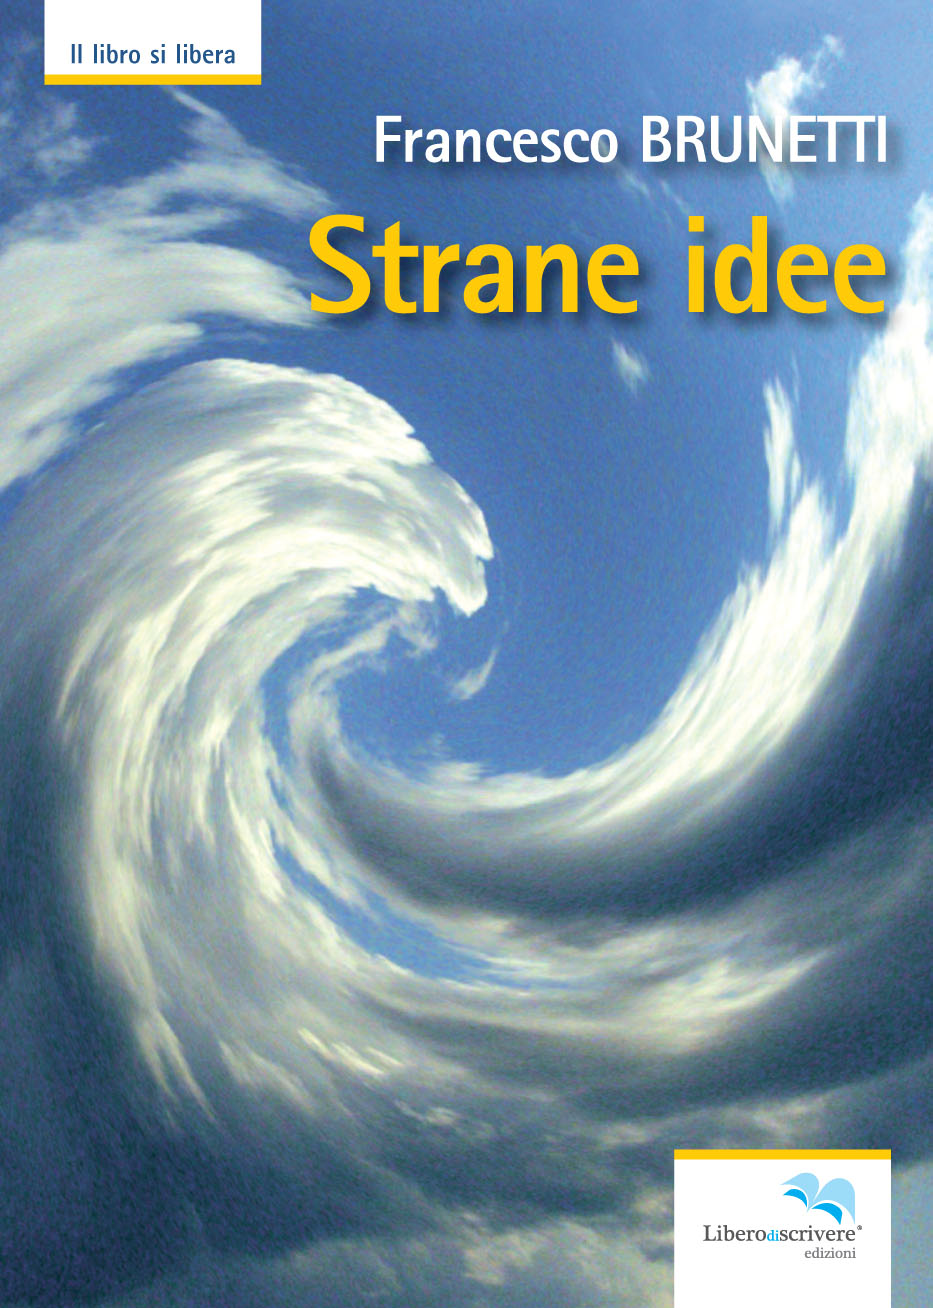 Liberodiscrivere francesco brunetti aiseop strane idee for Idee strane